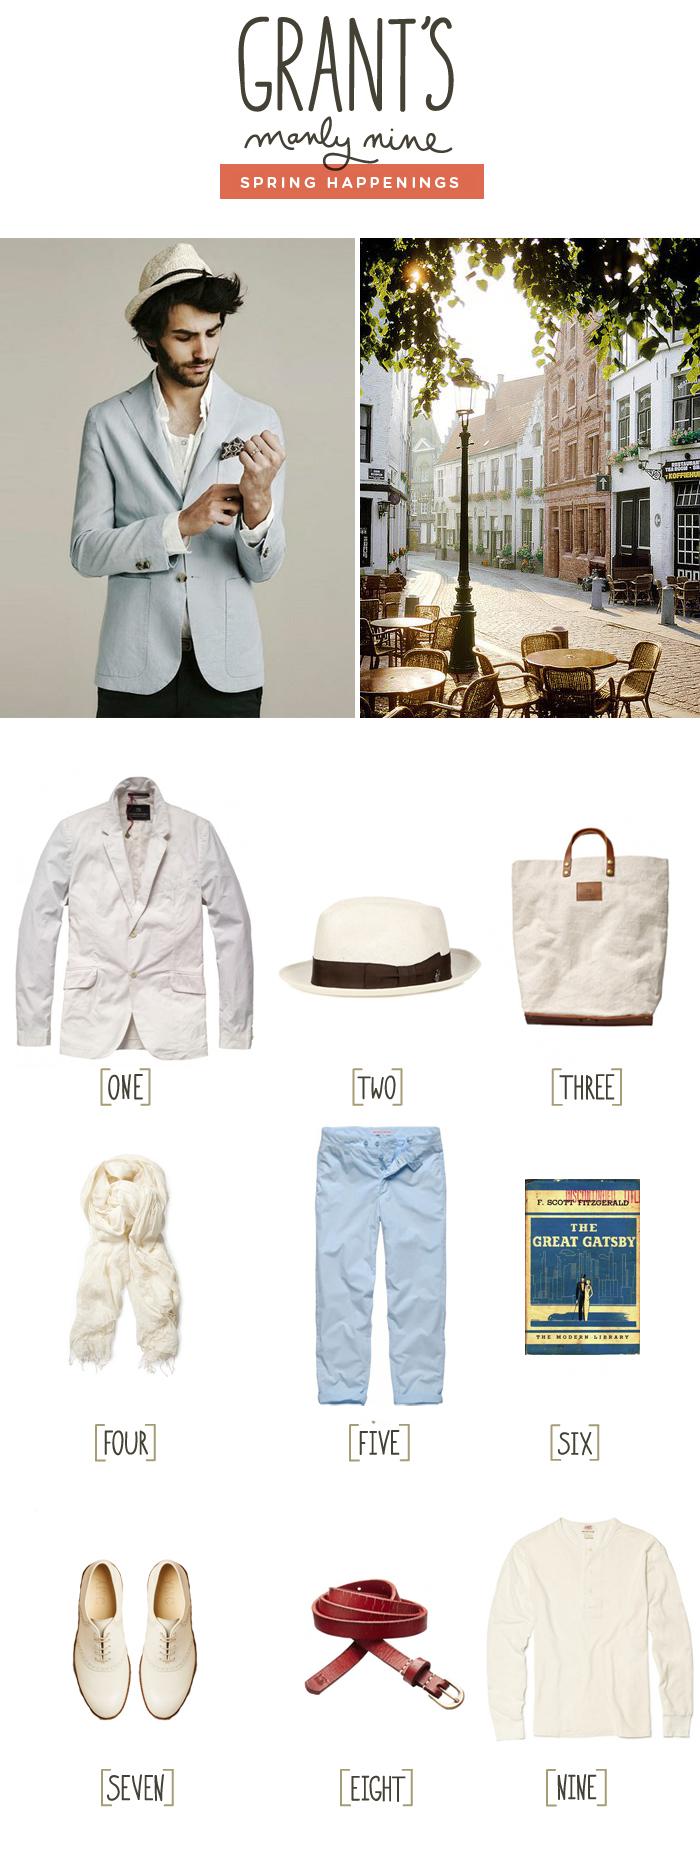 Grant Manly Nine, Men's Fashion Inspiration